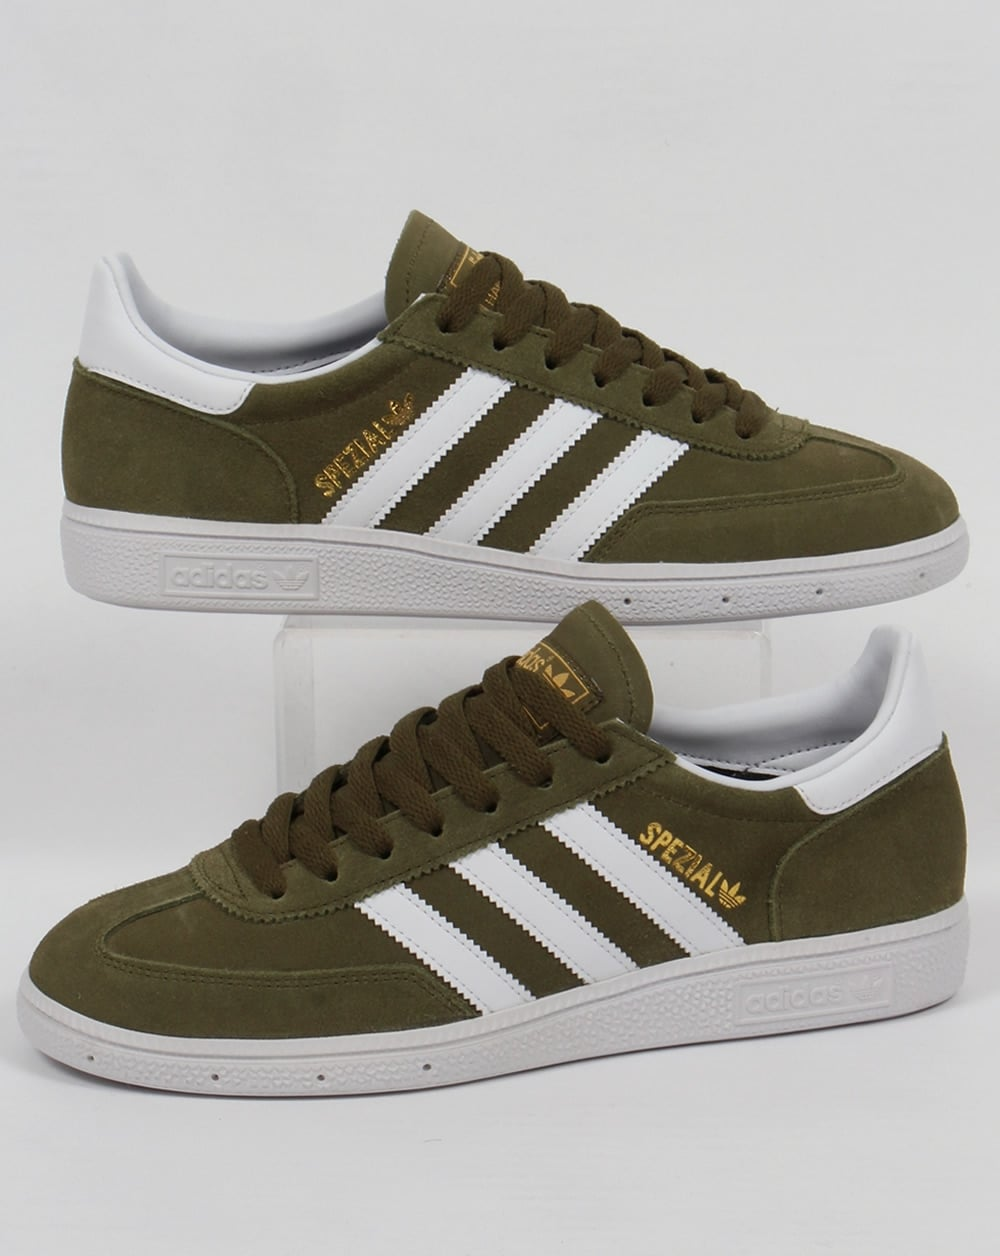 Adidas Spezial Trainers Dust Greenwhite